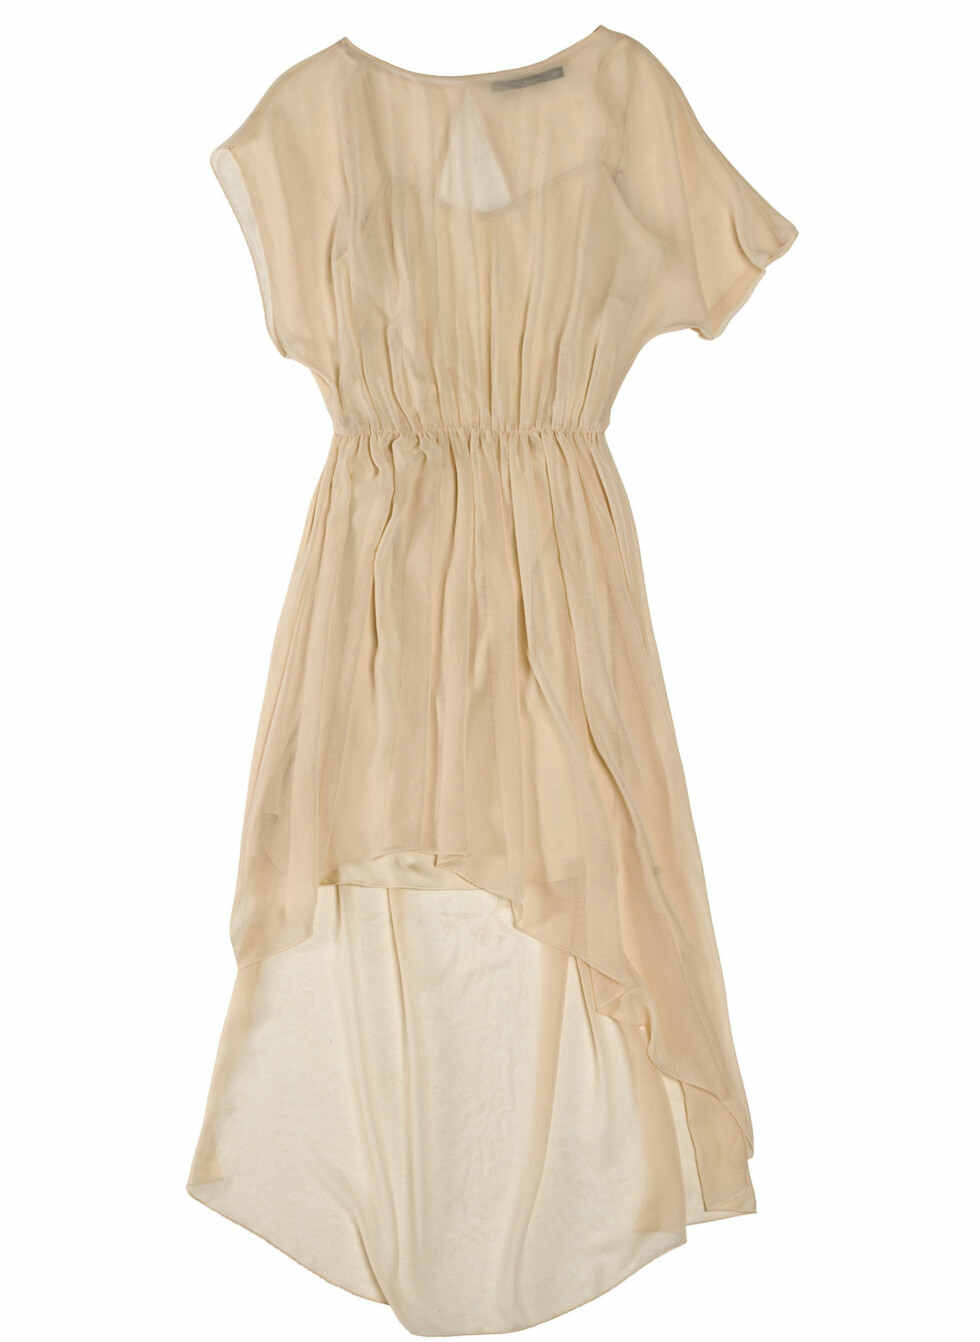 Asymmetrisk, nude kjole med transparente partier (Kr.699) Foto: Zara